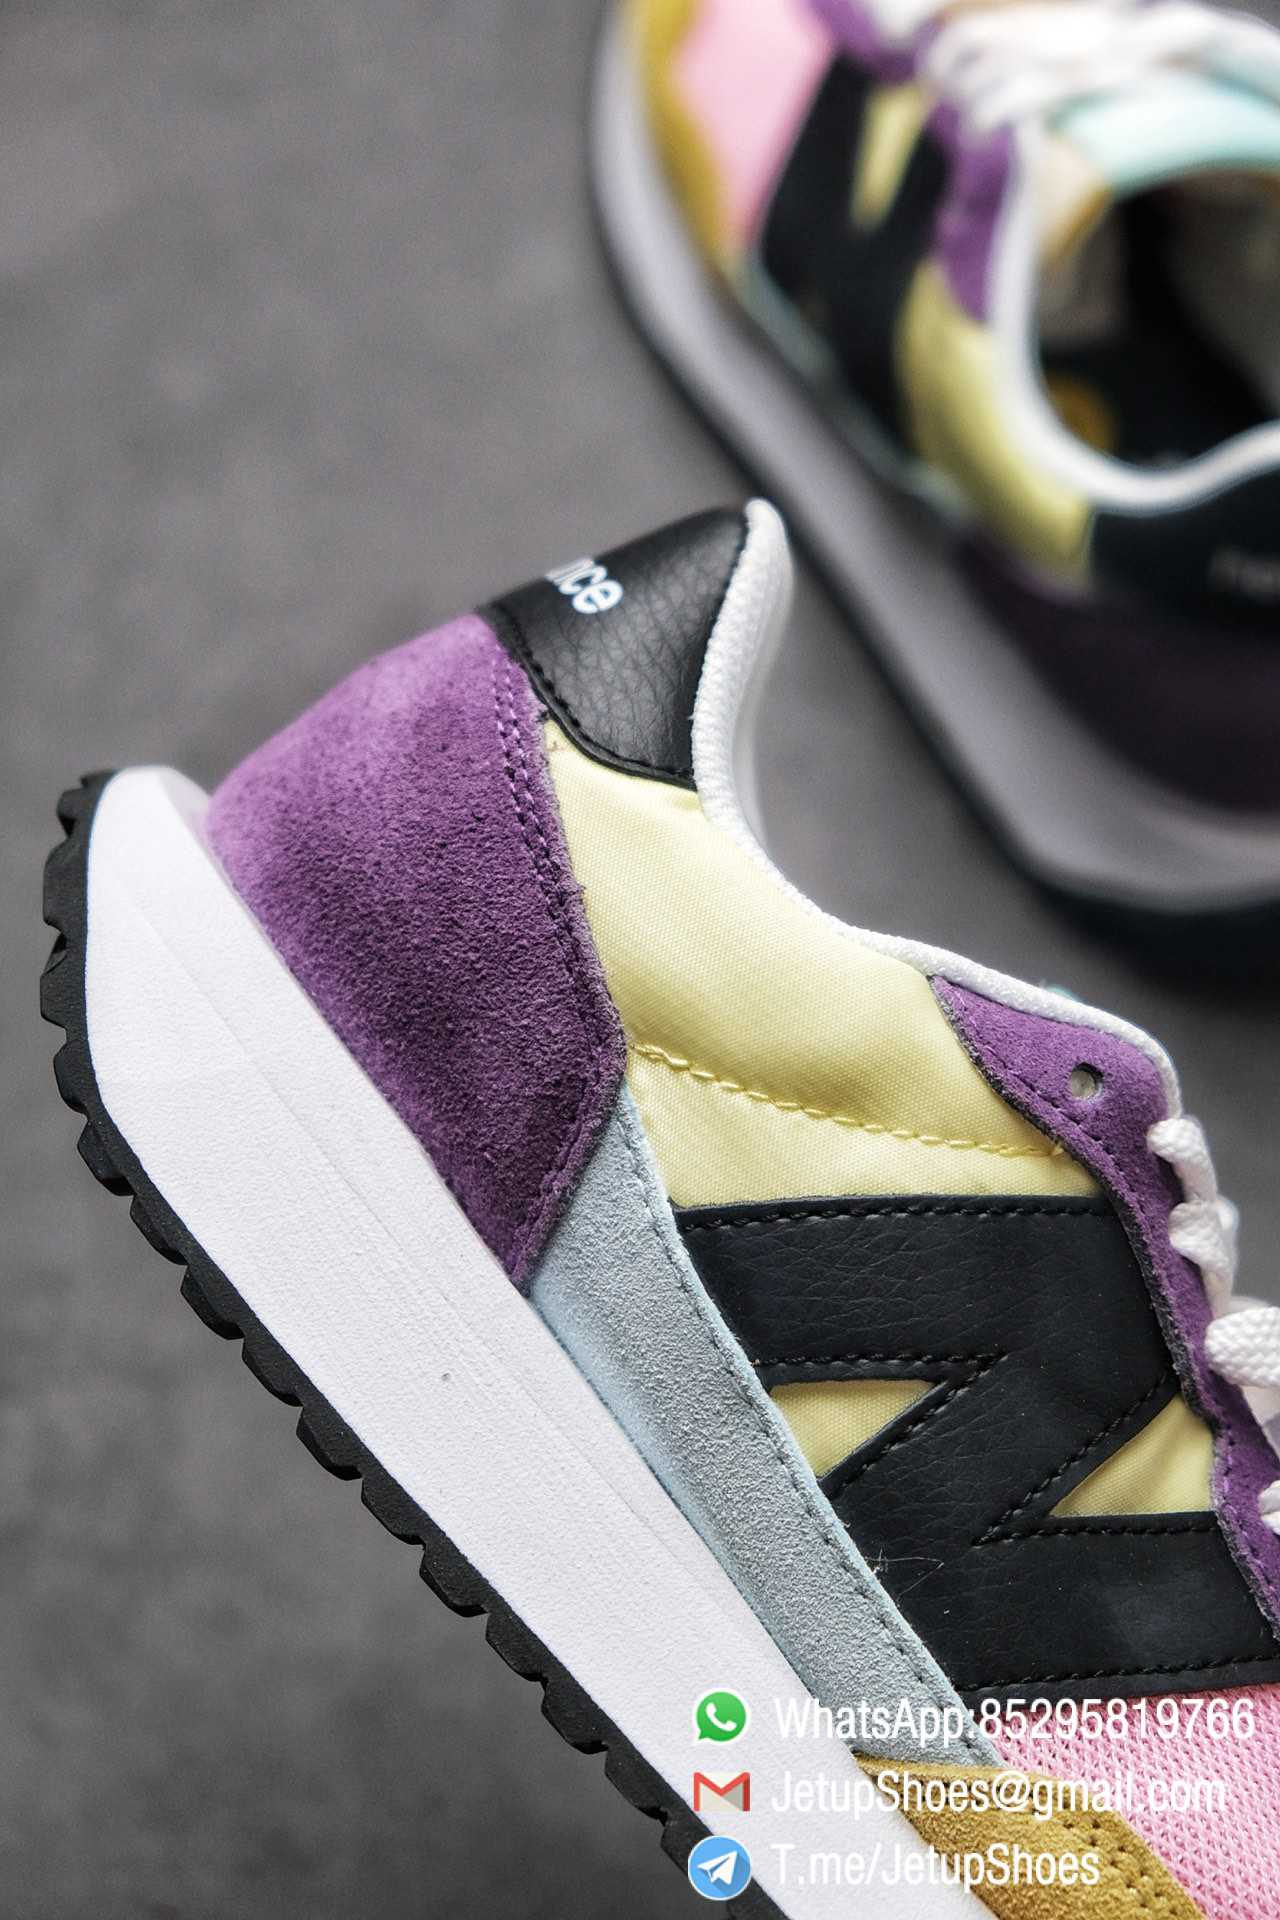 Best Replica 2021 New Balance 237 Yellow Purple Pink SKU MS237LB3 High Quality Running Shoes 05